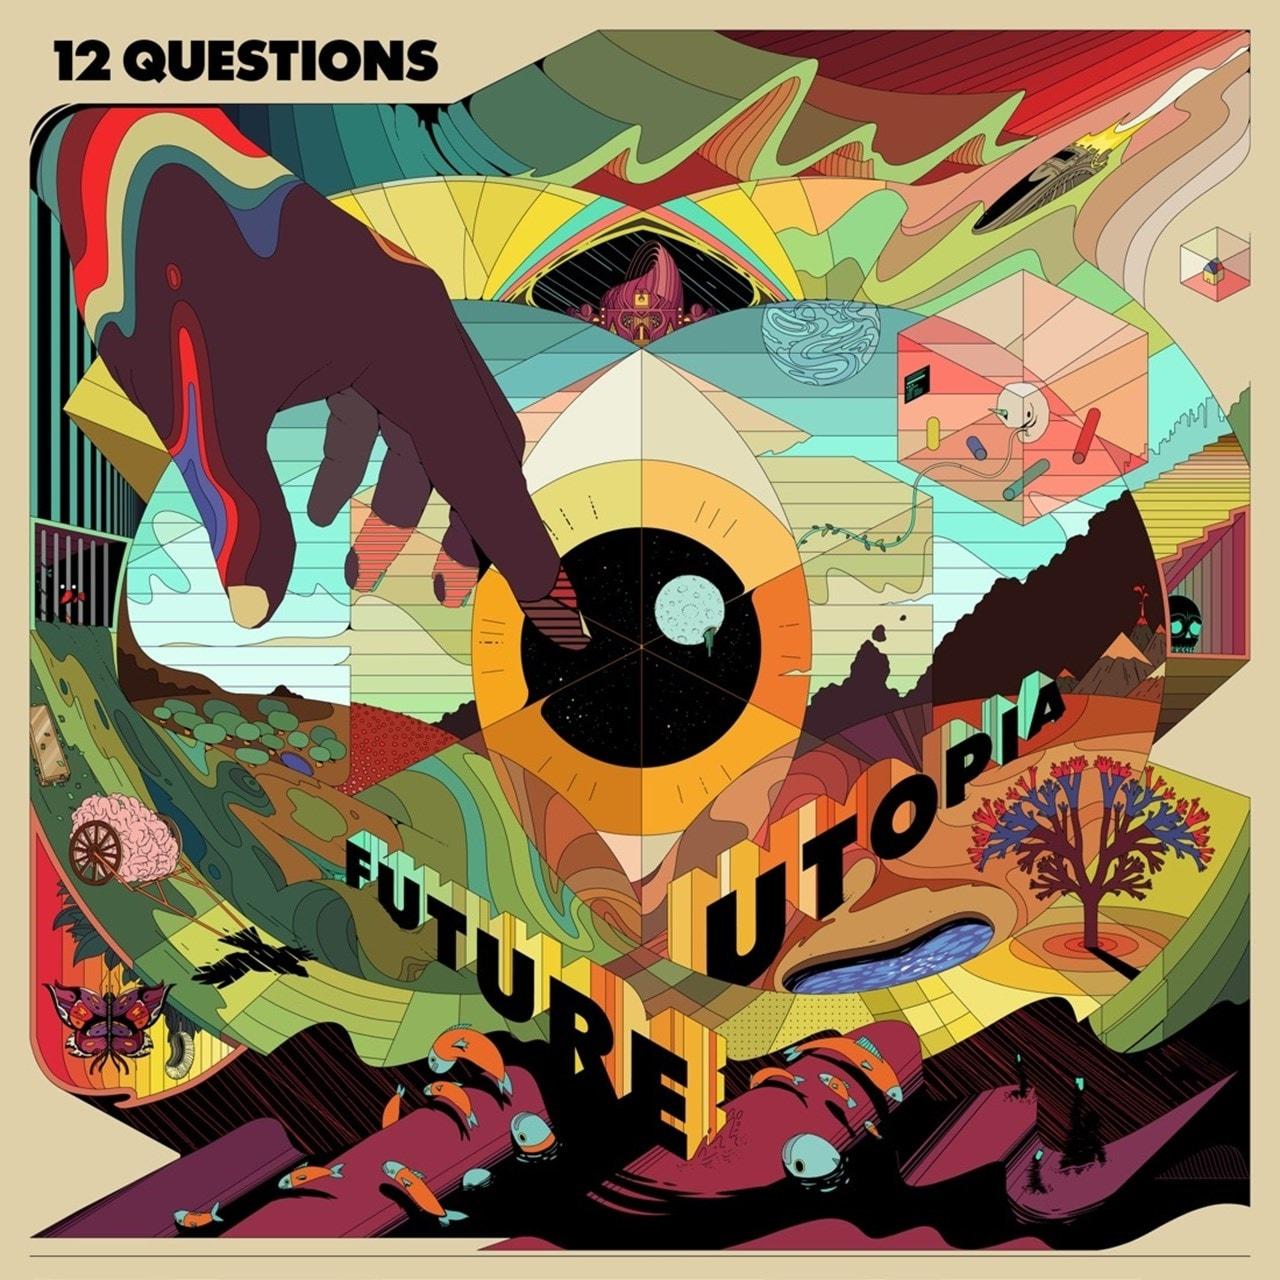 12 Questions - 1